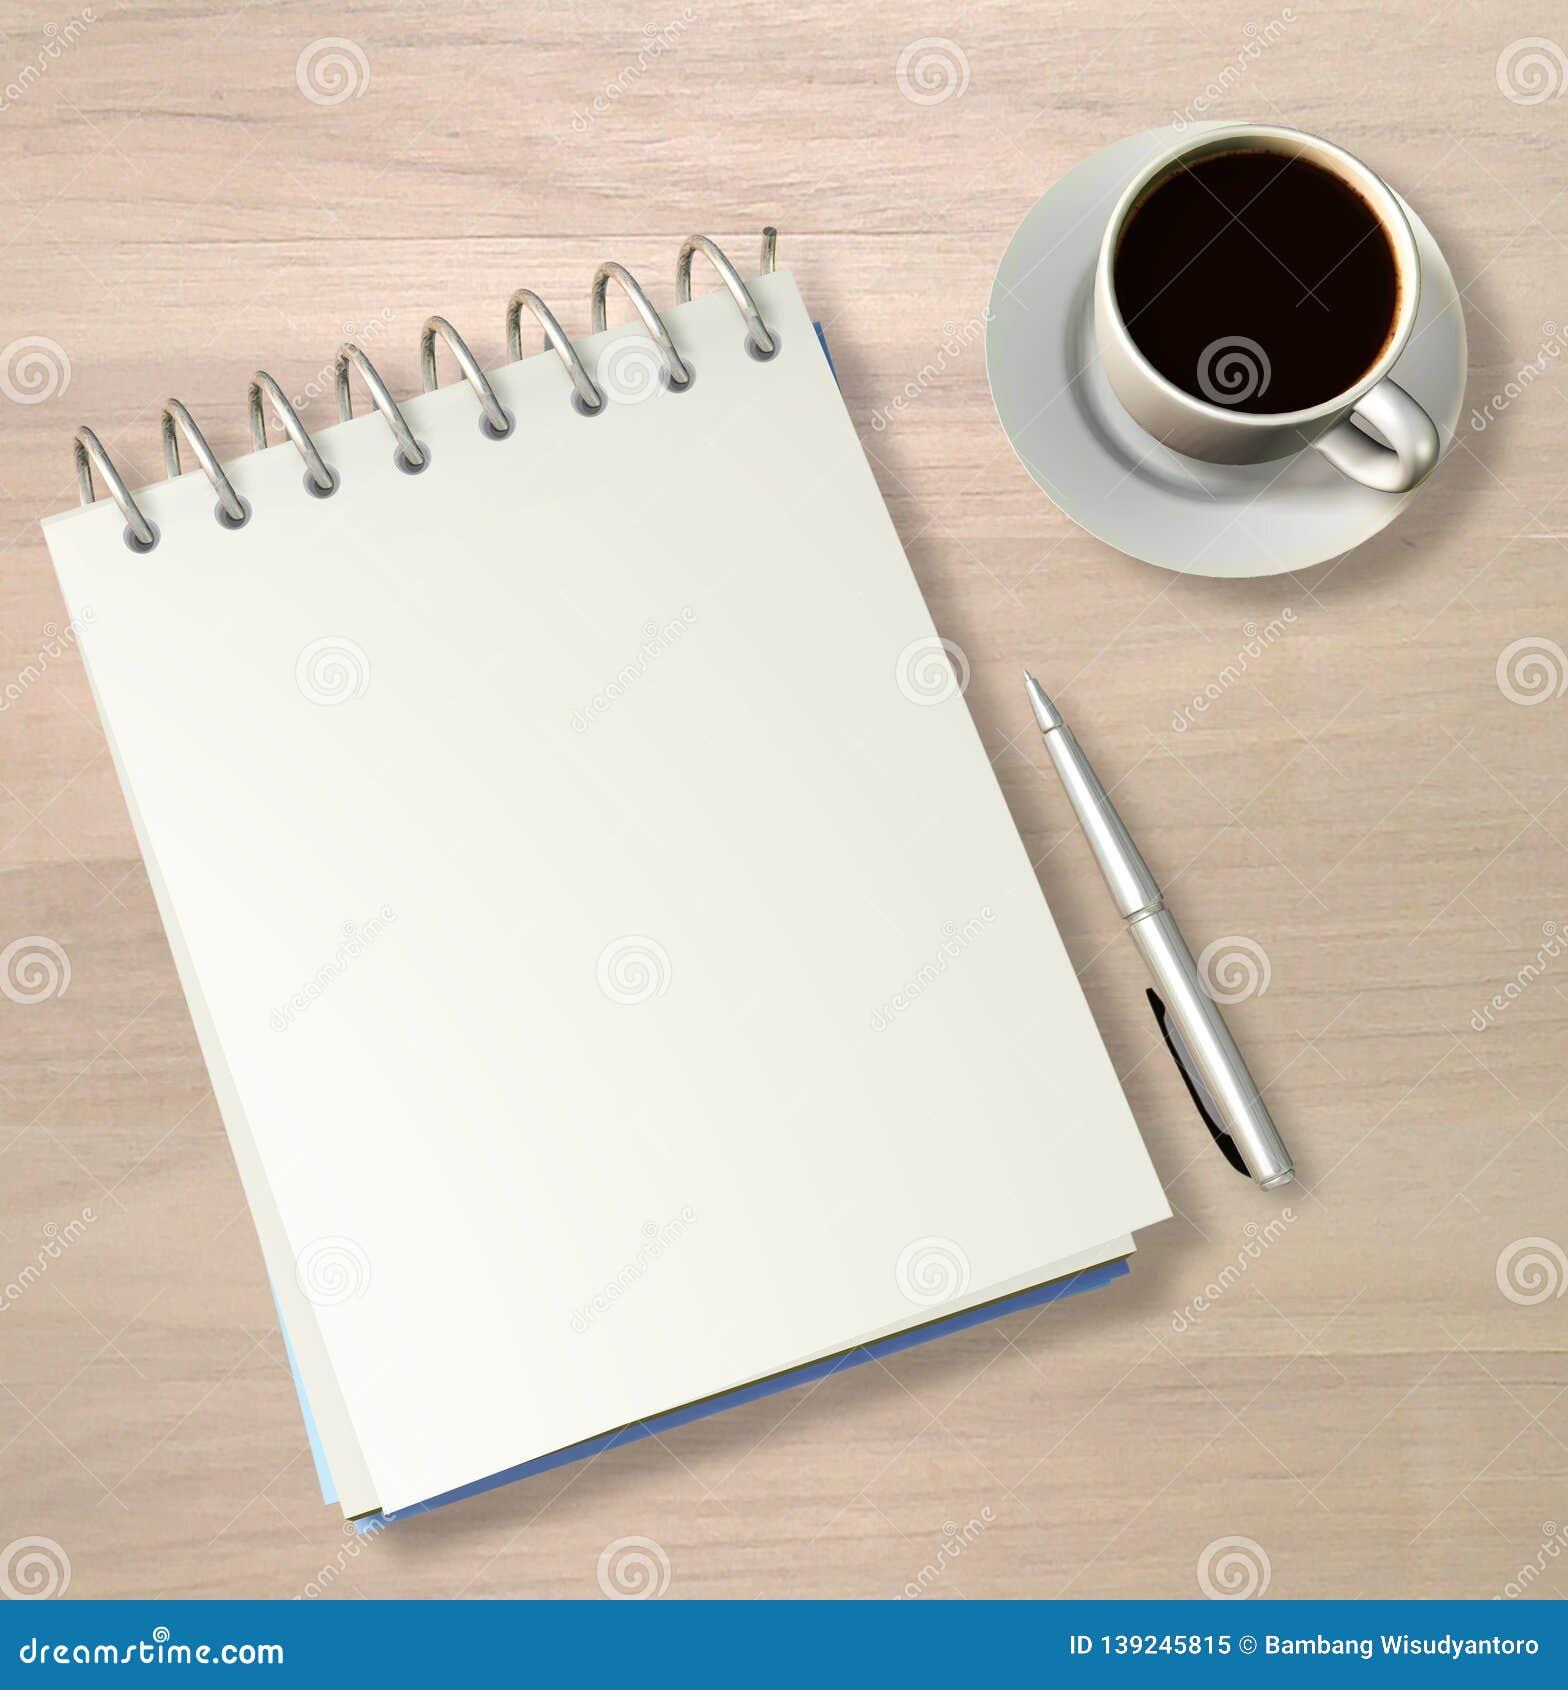 Wirebound Note Book, Pen And Black Coffee - 3D Render